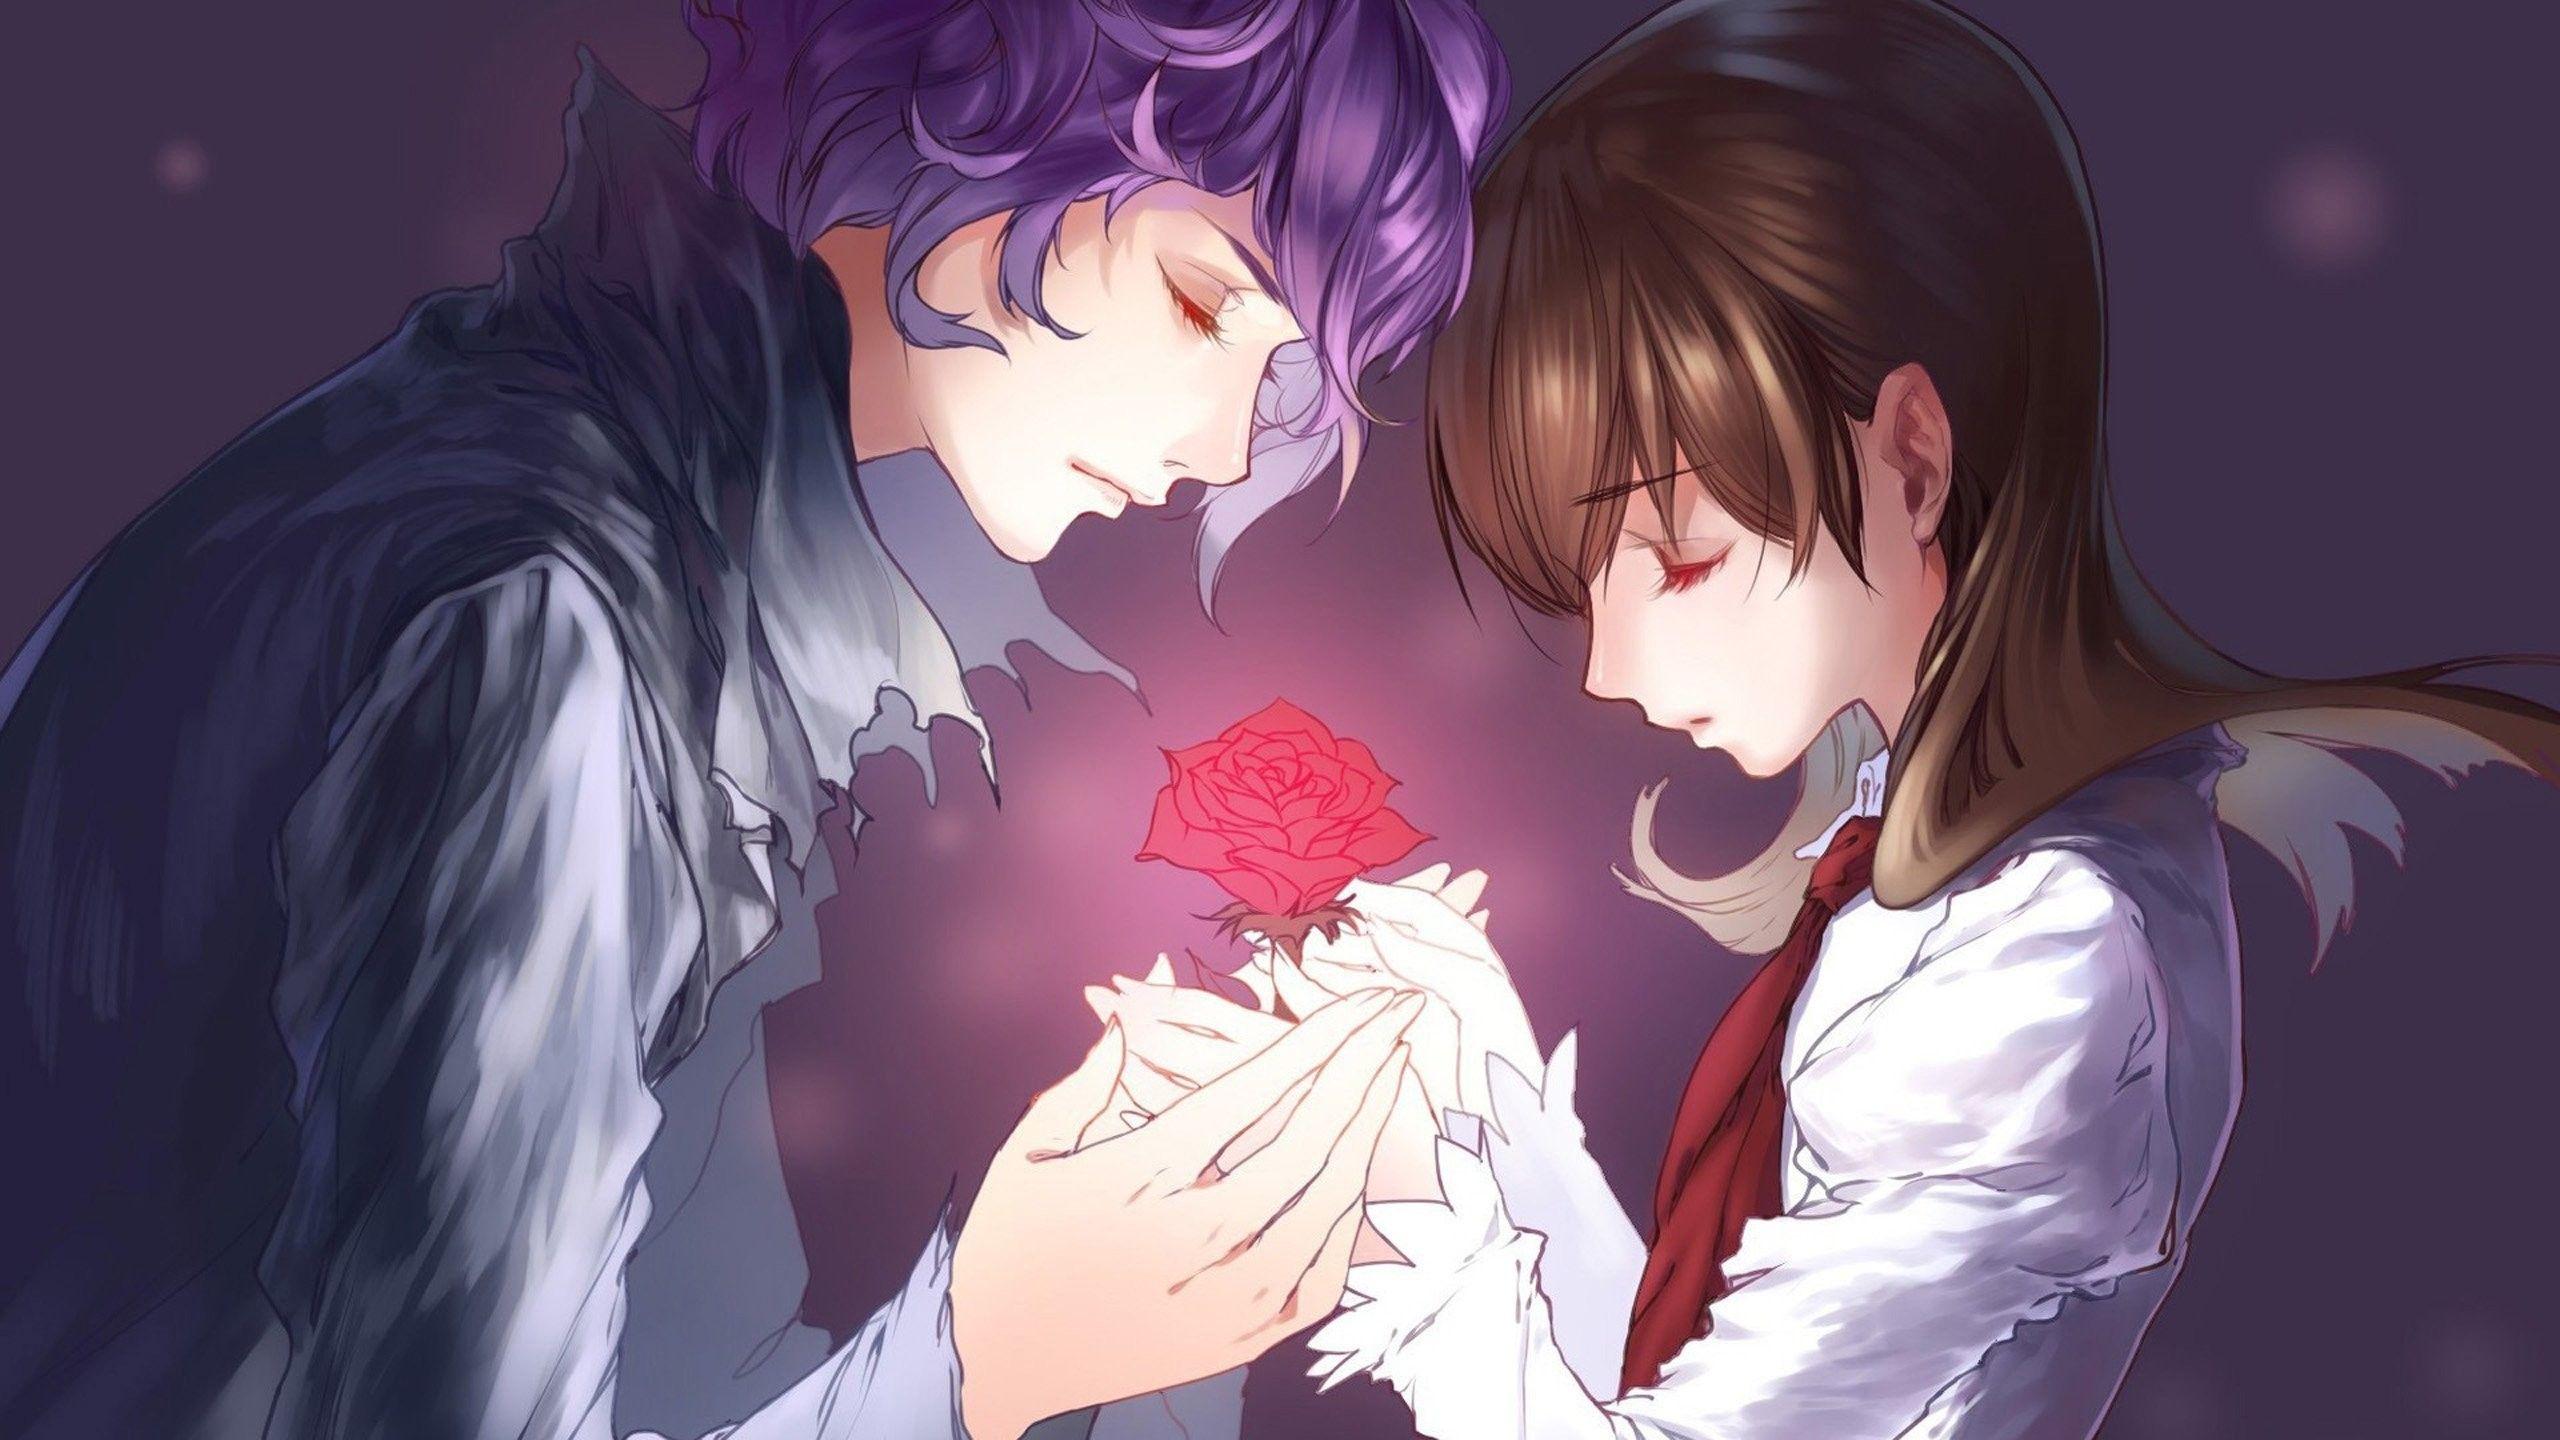 Cute Anime Couple Wallpaper 1080p Romantis